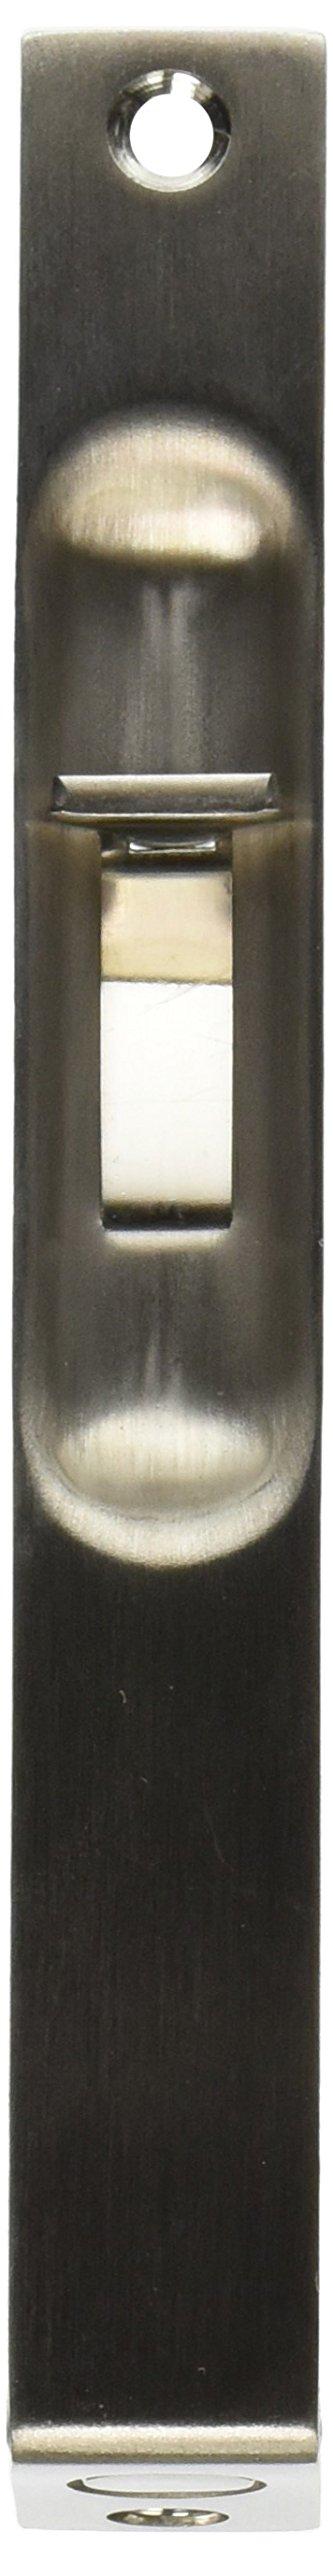 Deltana 6FBS32D HD Stainless Steel 6-Inch Flush Bolt